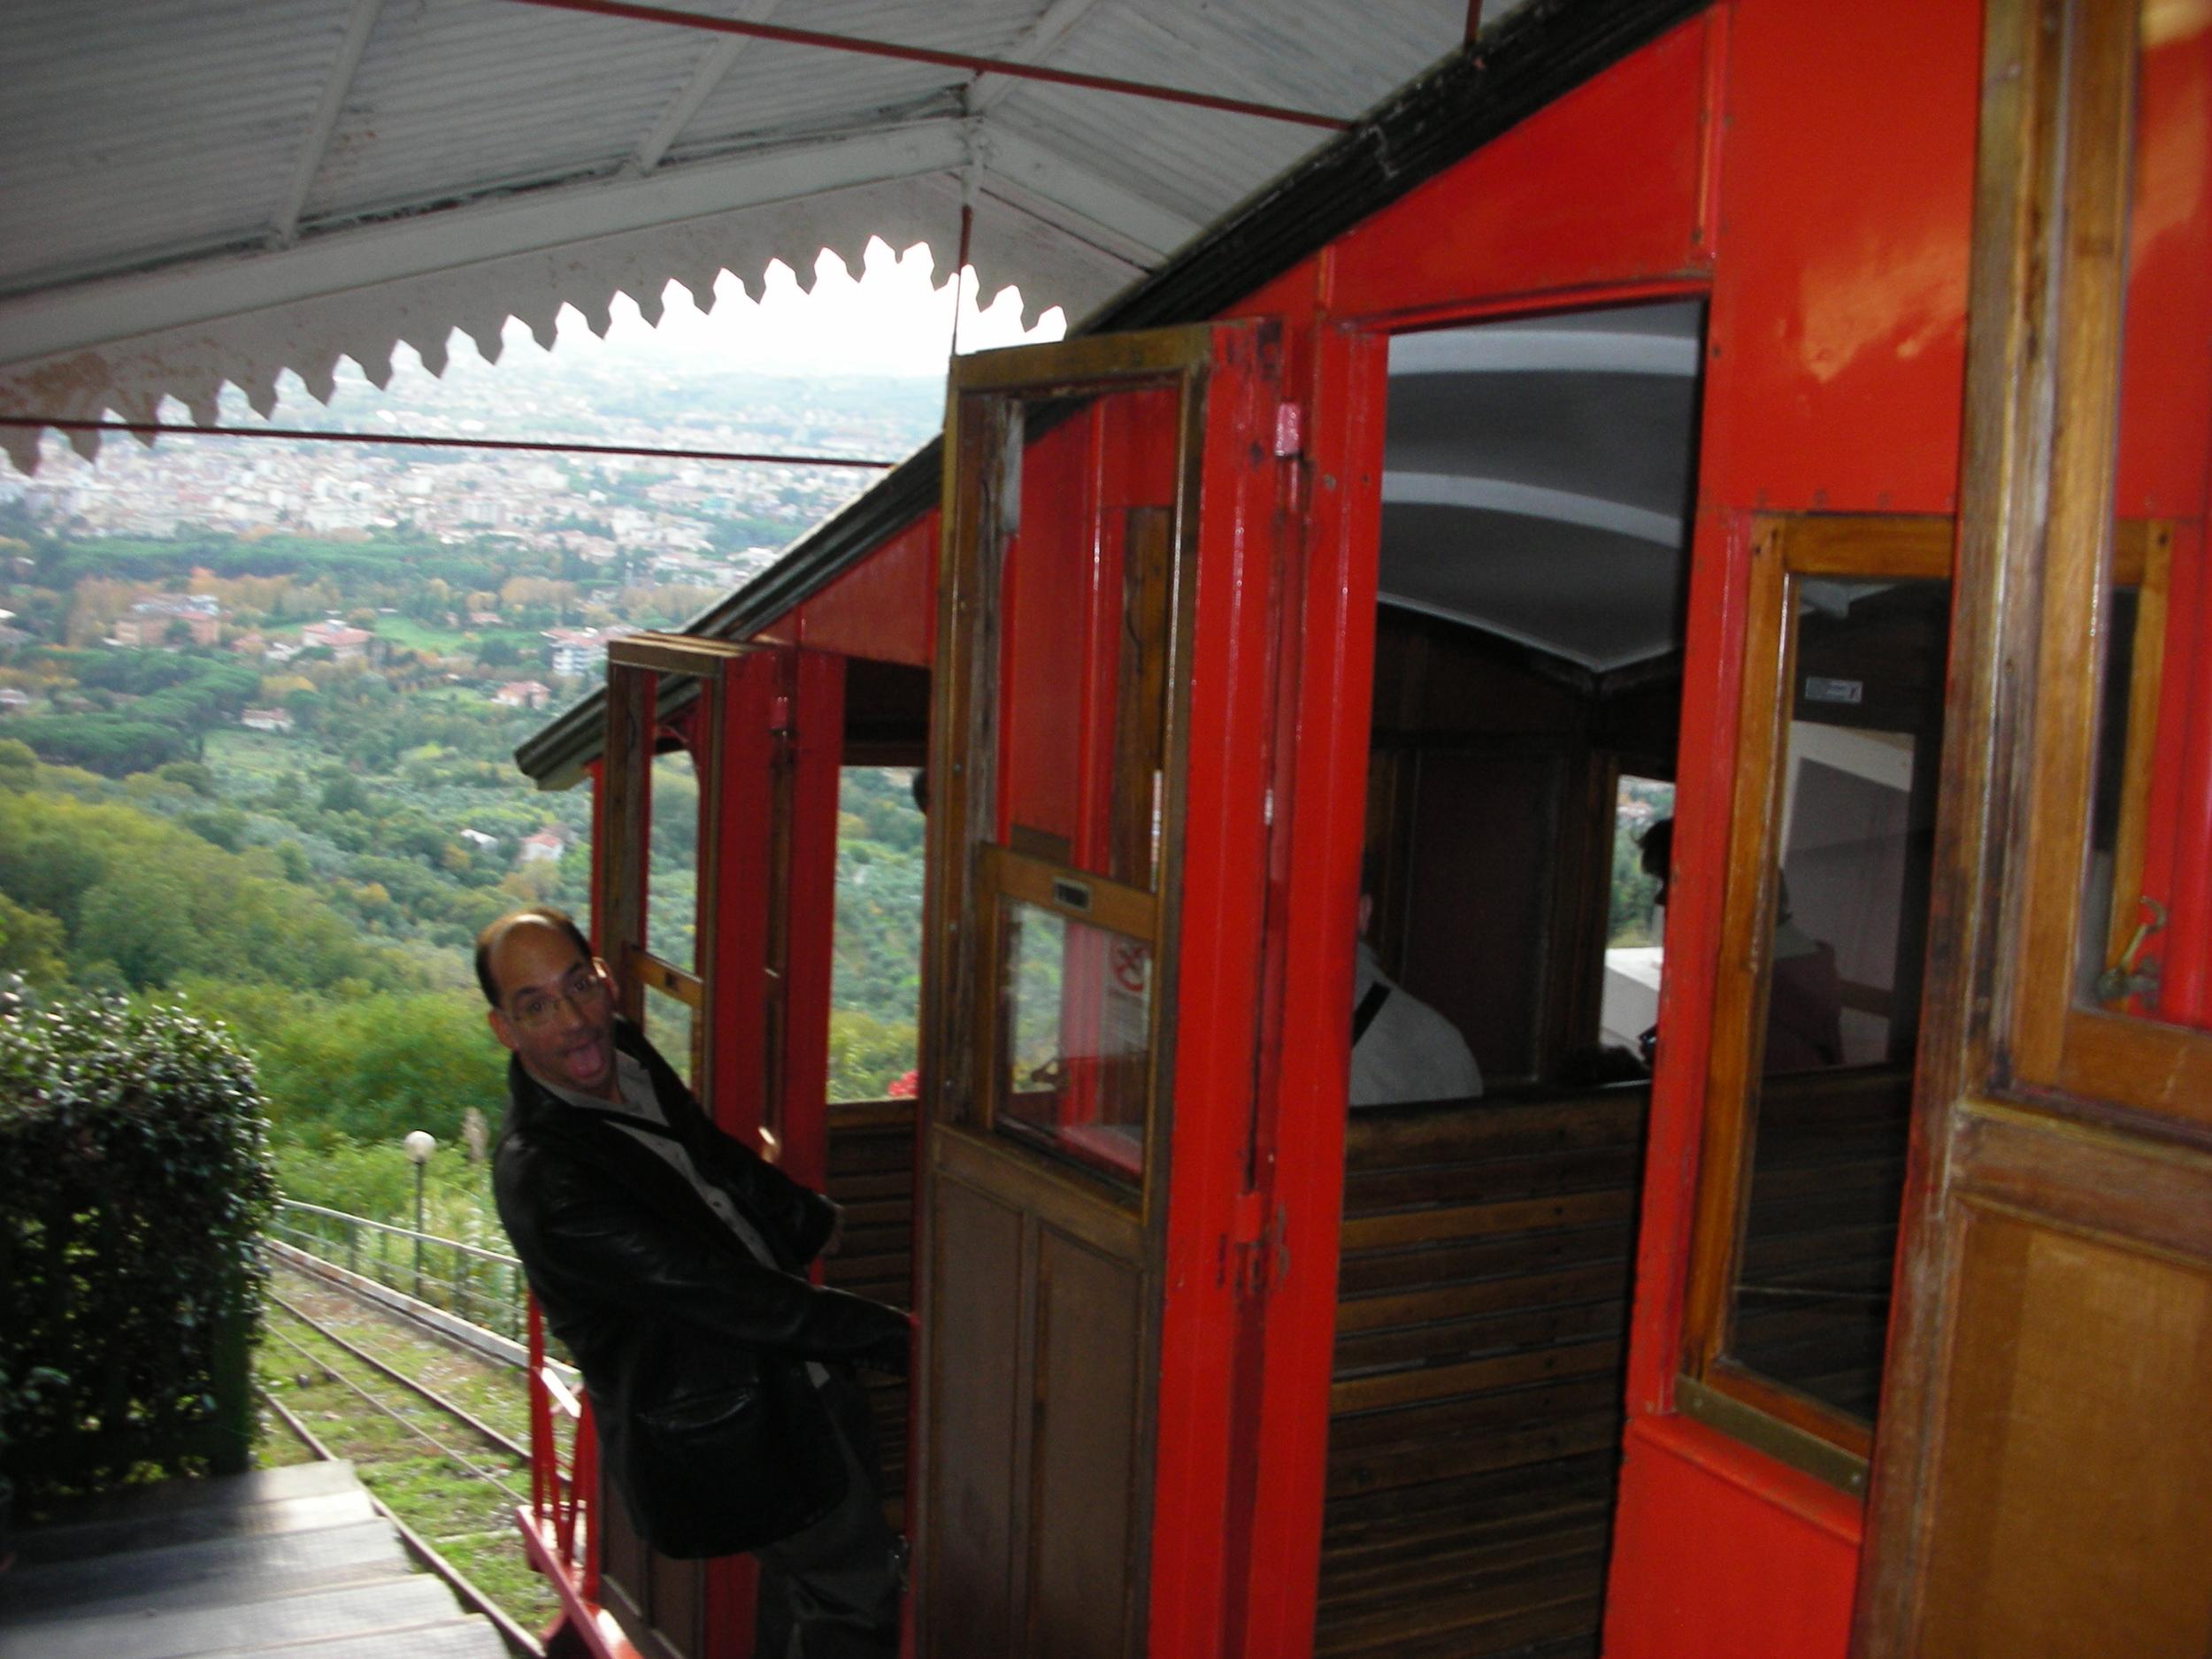 CRO Italy web 2007 - 02.JPG